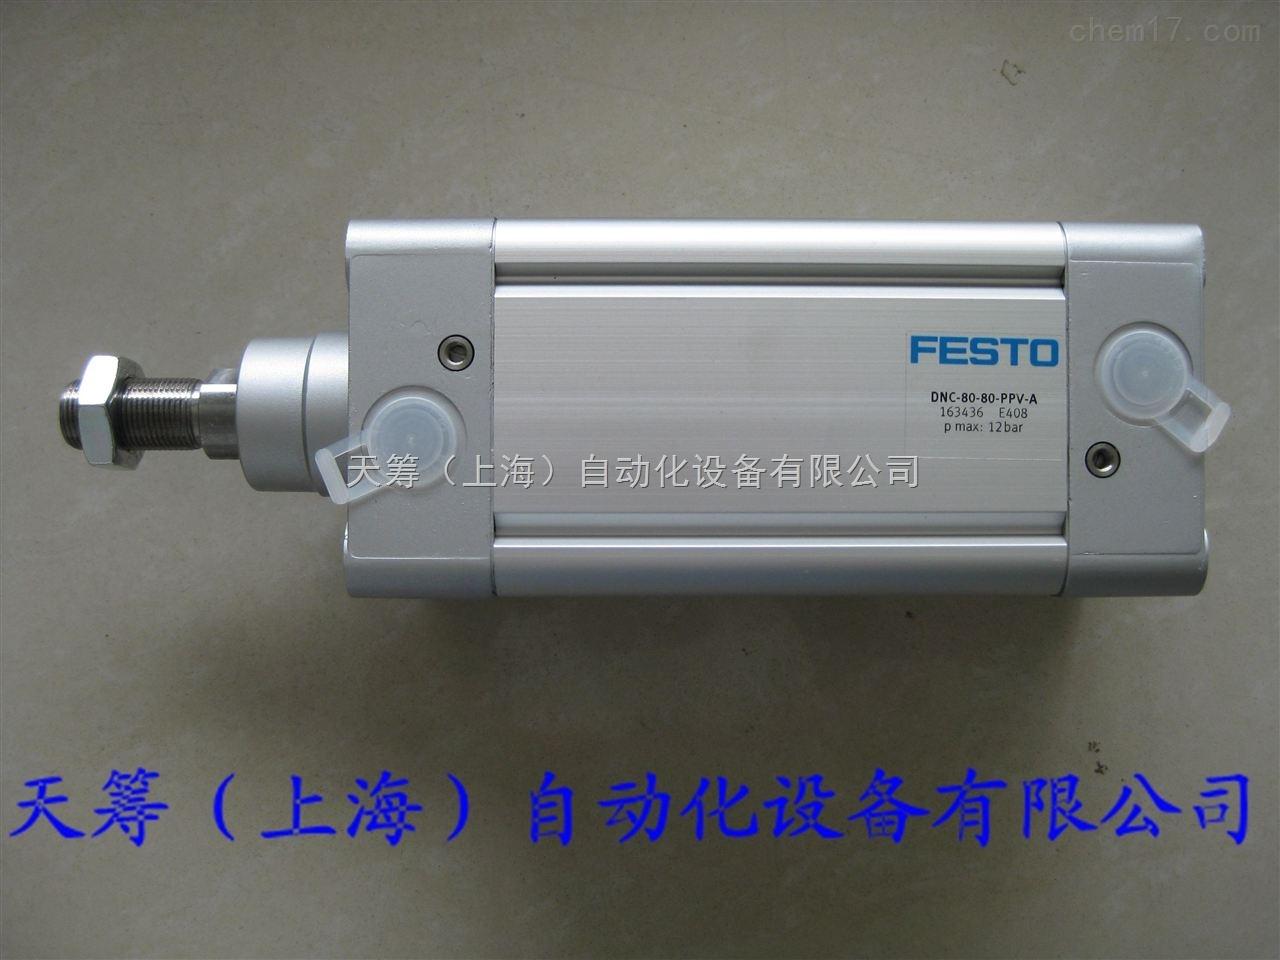 FESTO德国festo标准气缸DNC系列DNC-80-80-PPV-A